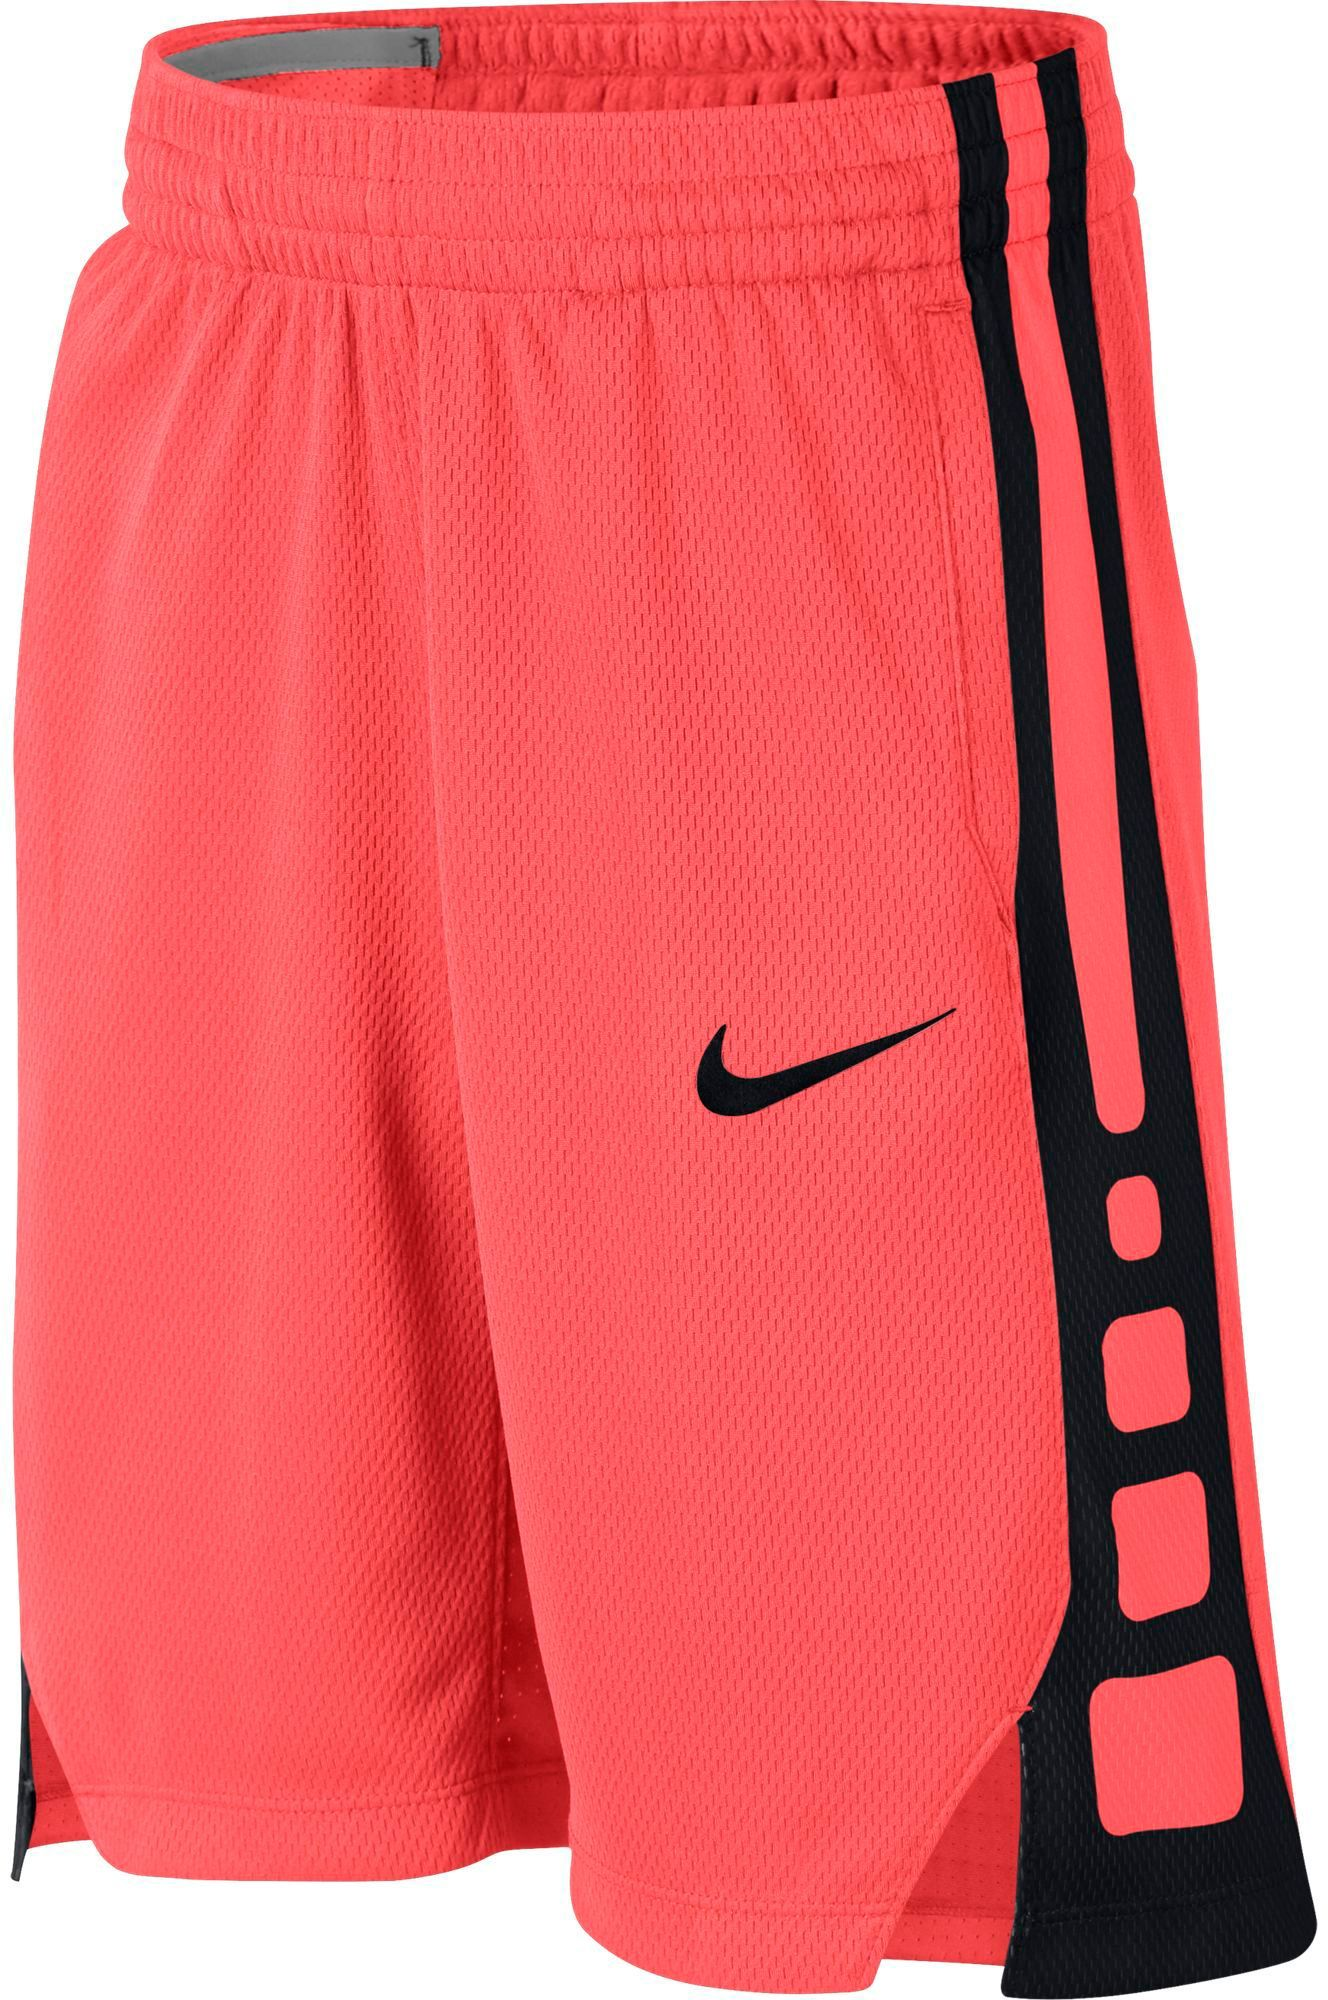 Nike Boys Dry Elite Stripe Basketball Shorts Size Xs Hot Punch Black Basketball Clothes Girls Basketball Clothes Basketball Shorts